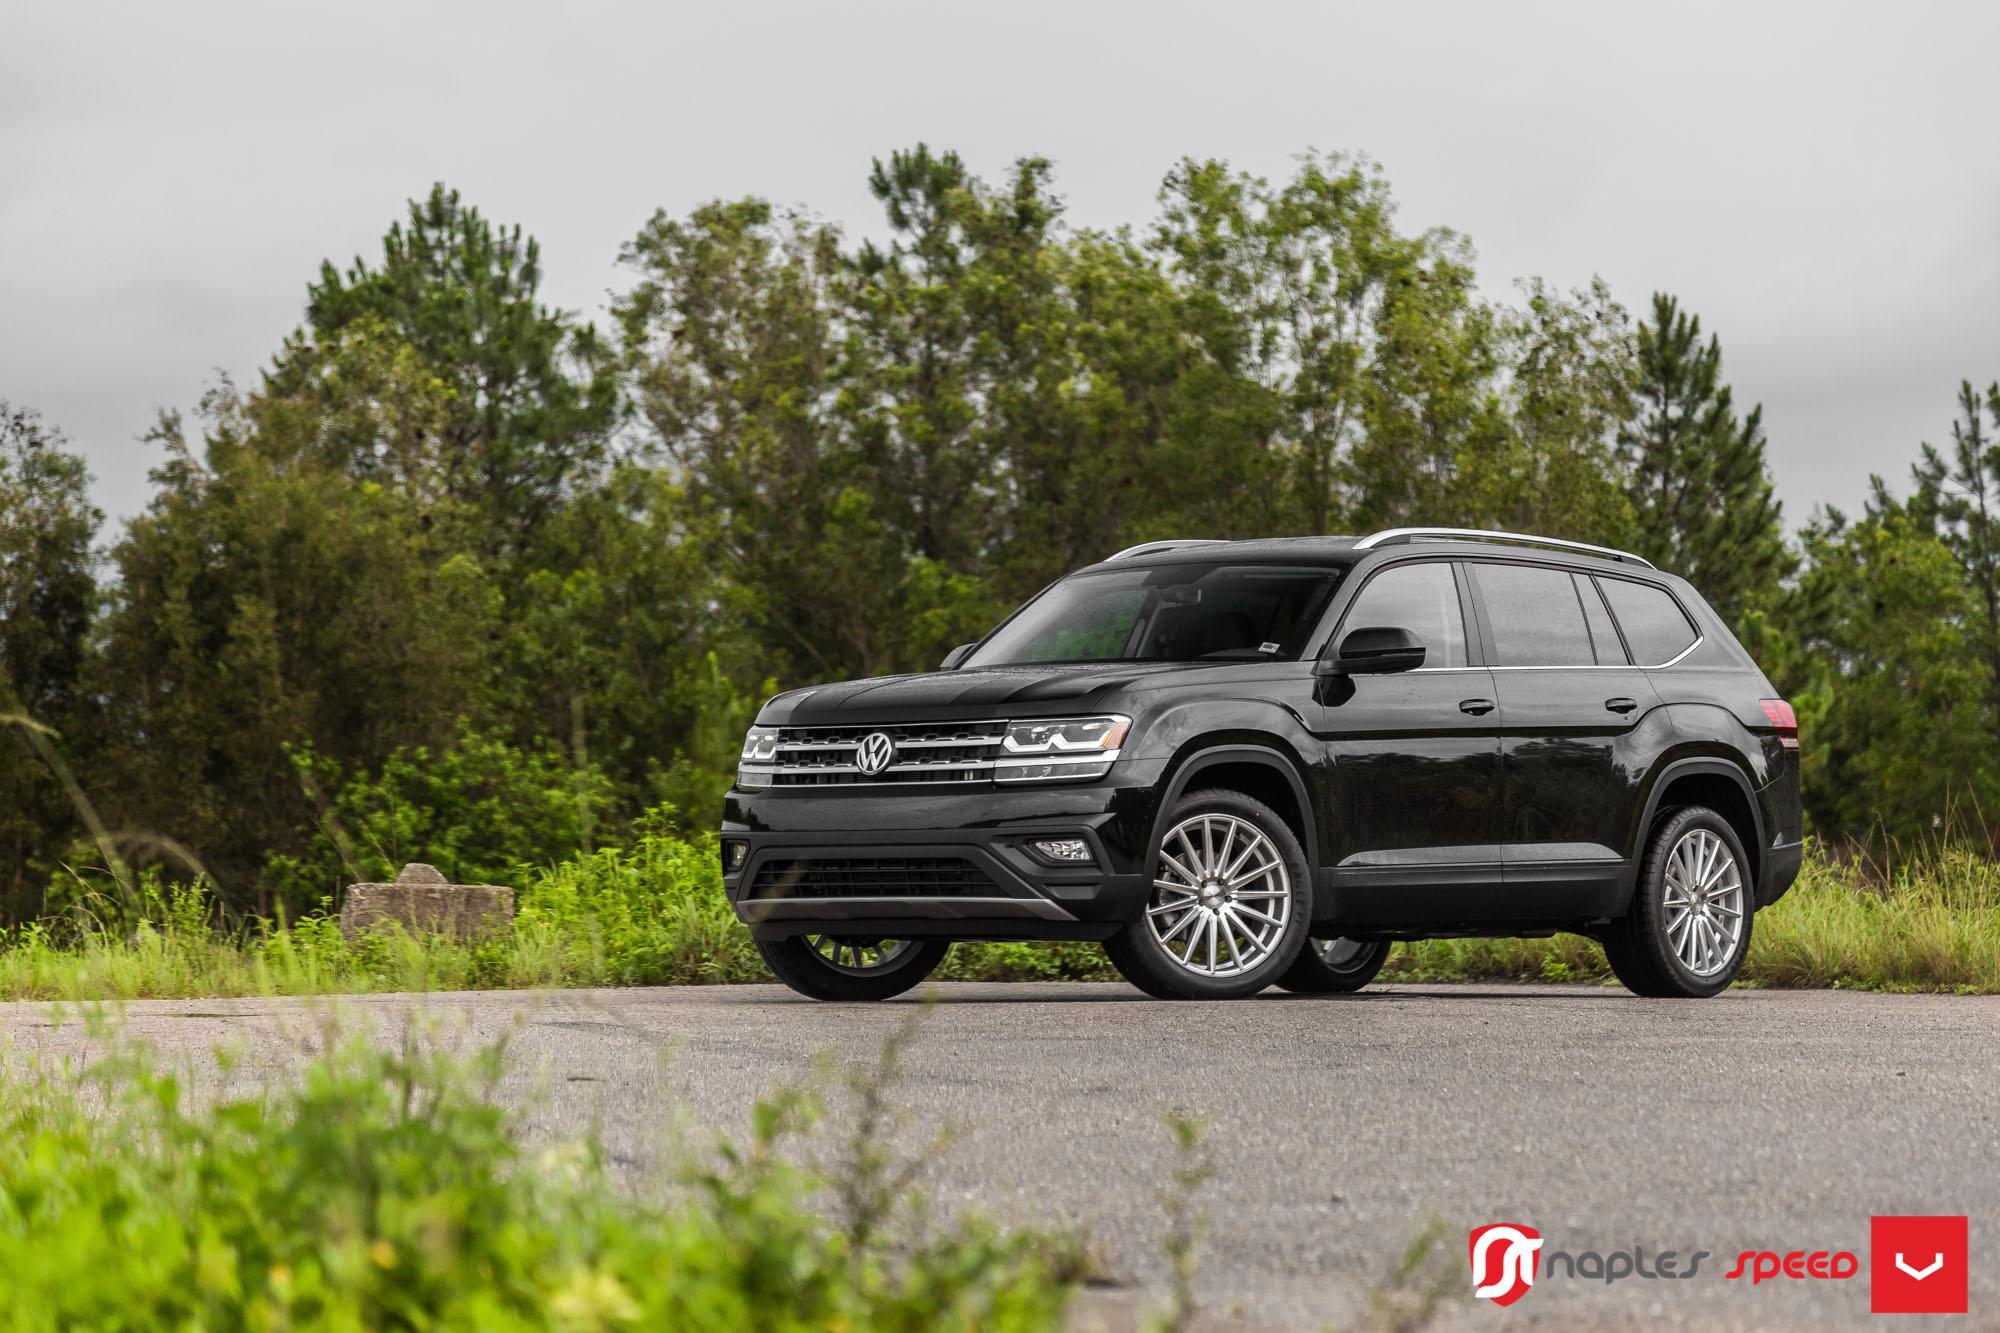 Vw Of America >> Volkswagen Atlas Gets Vossen Wheels in First Mild Tuning Project - autoevolution